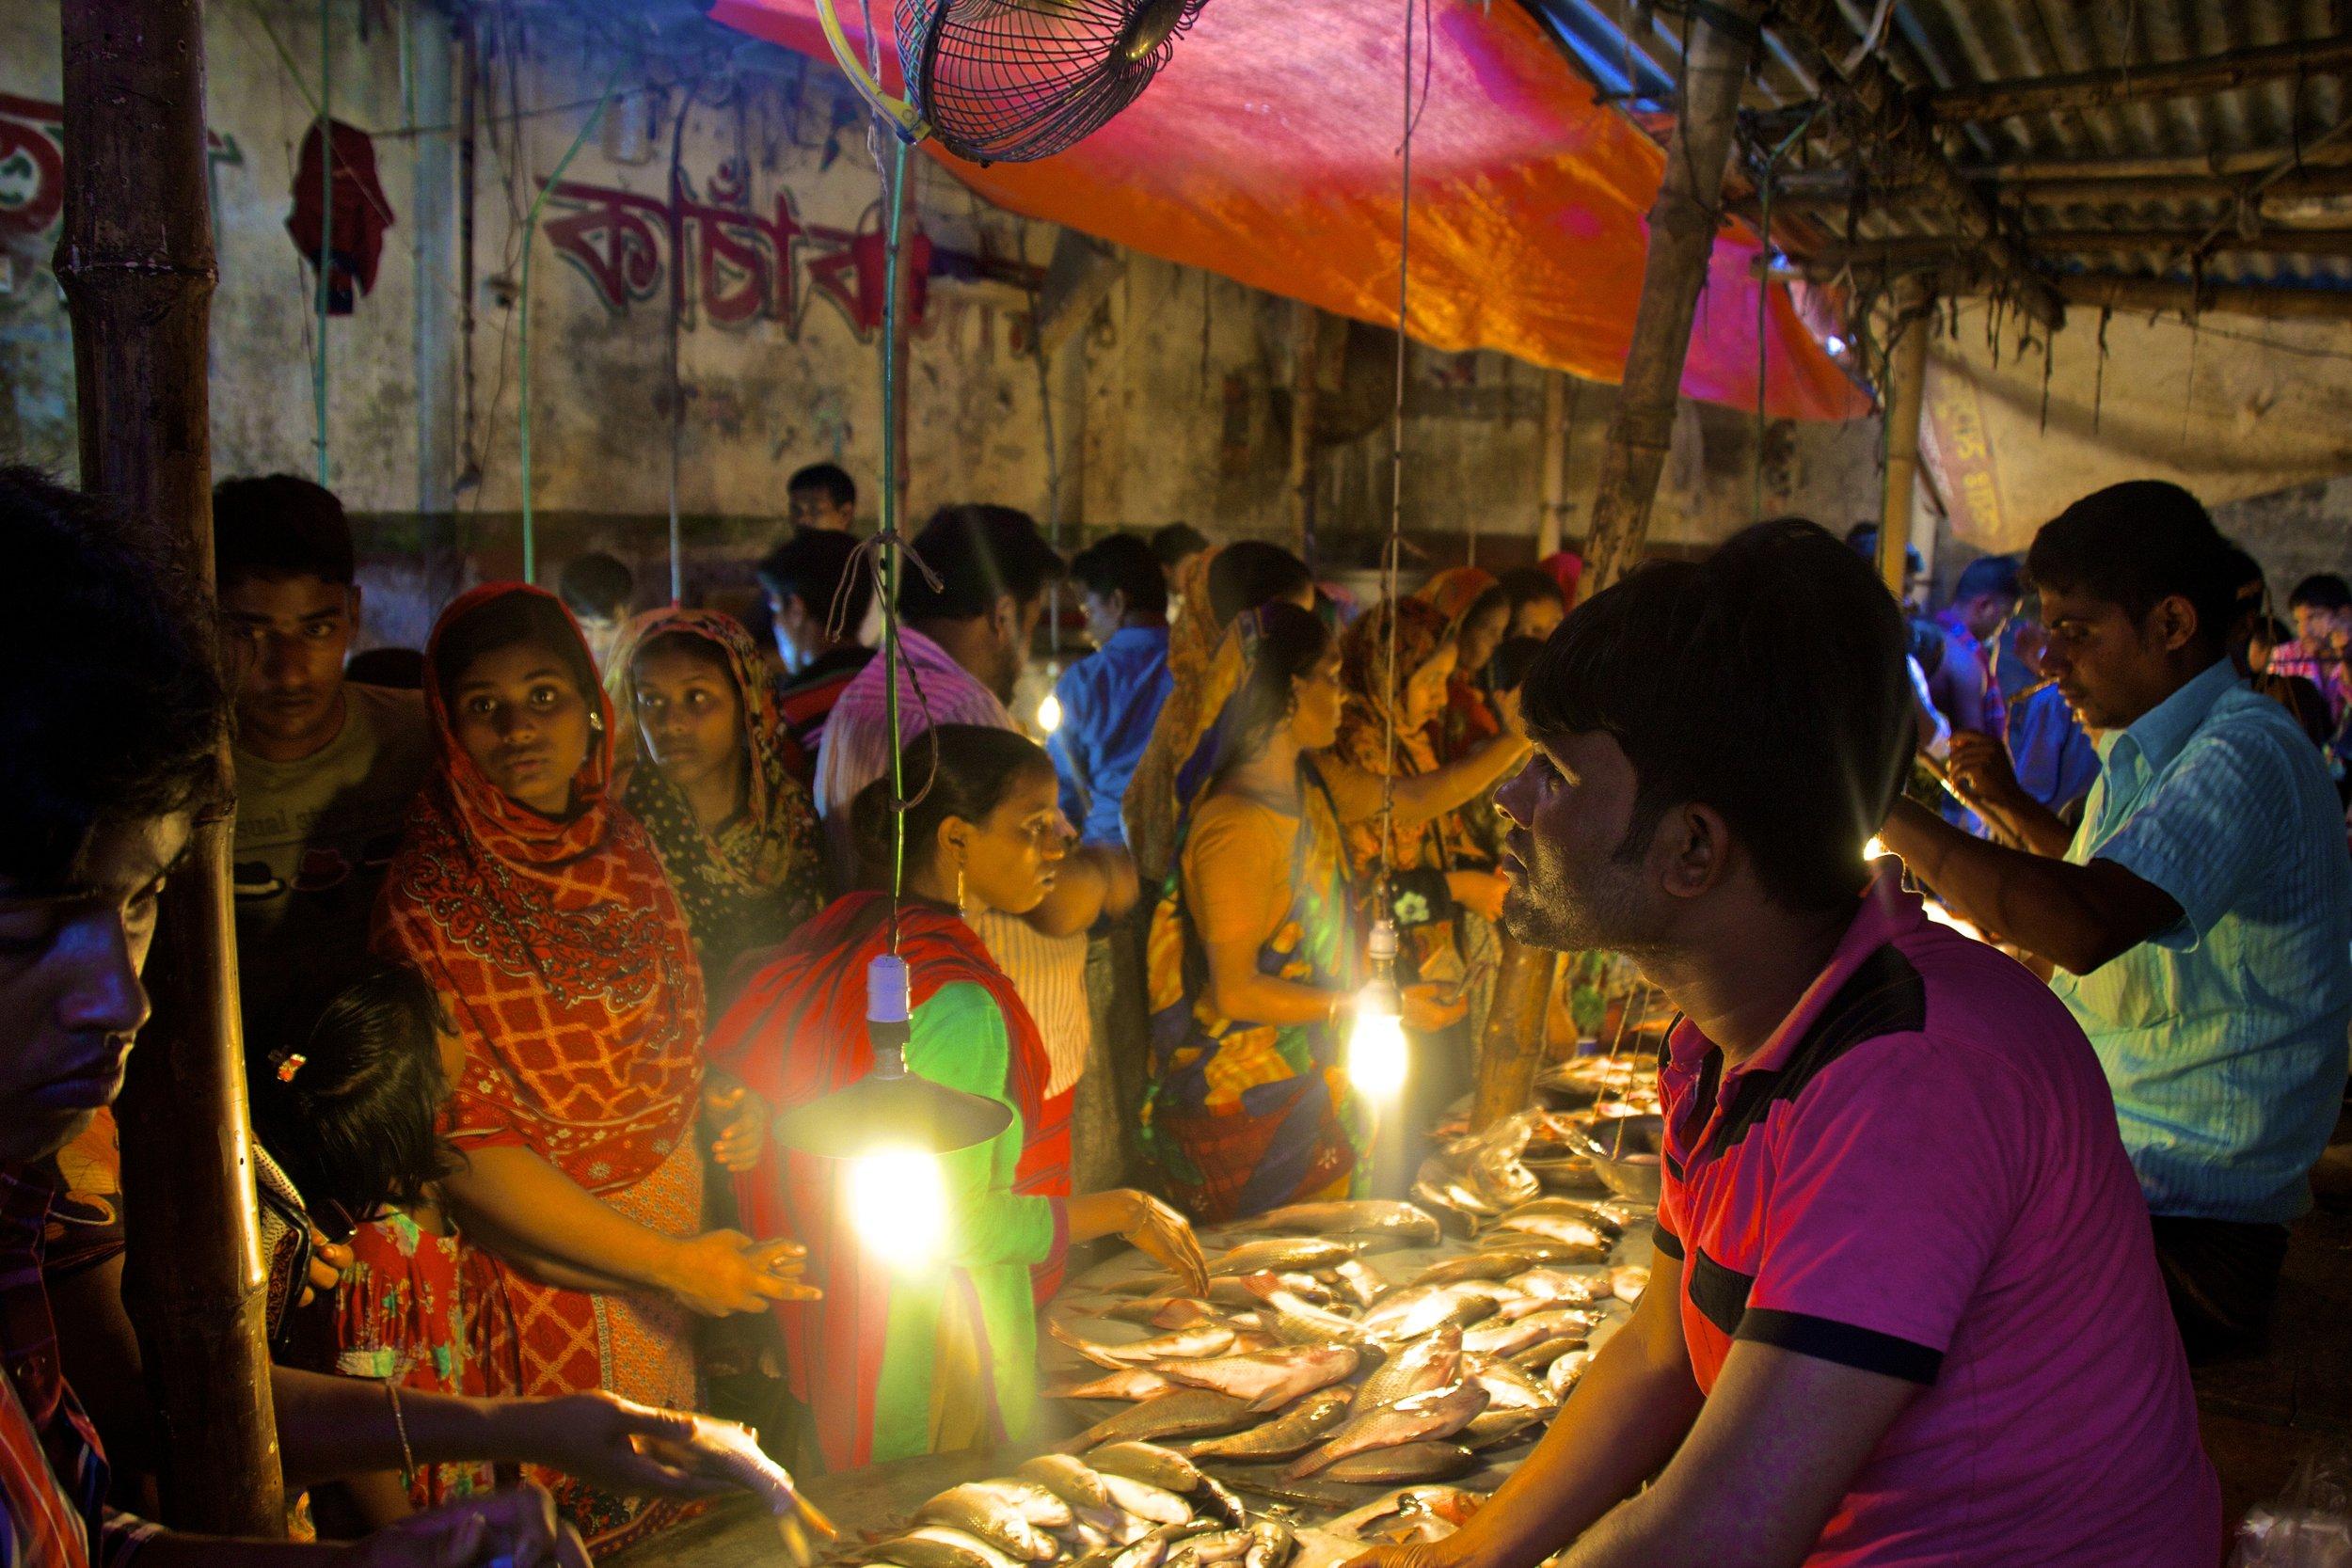 dhaka rayer bazar slum market 3.jpg